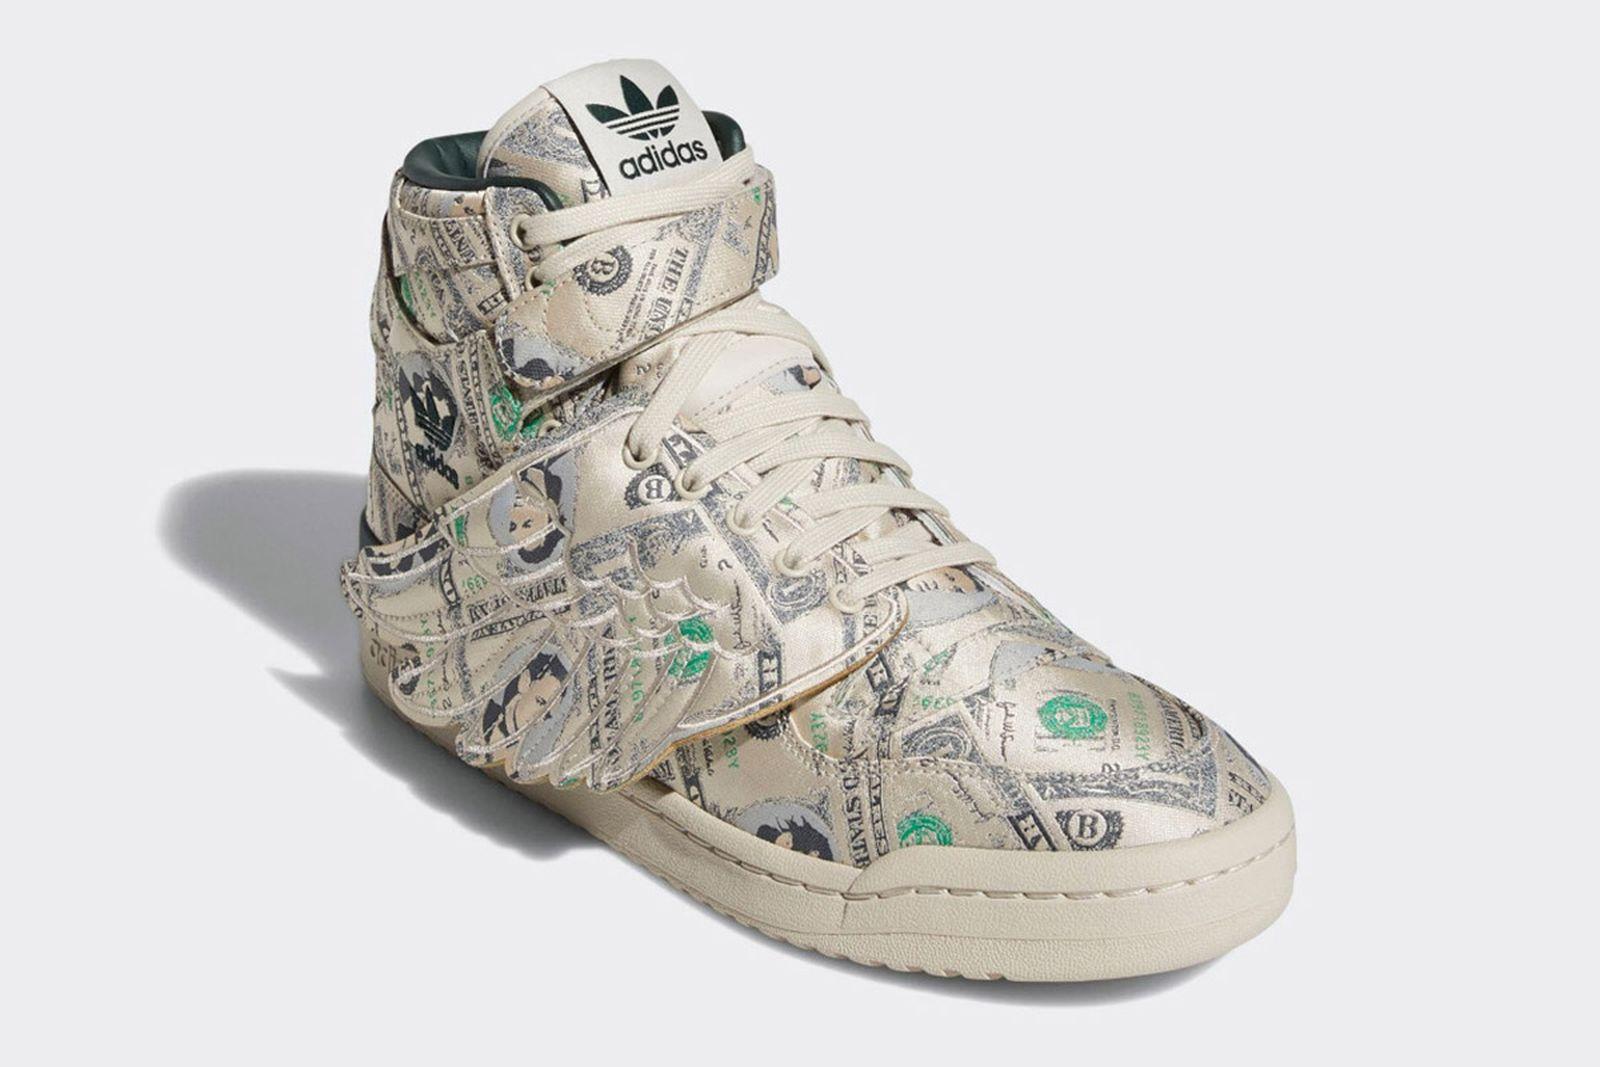 jeremy-scott-adidas-collaboration-return-01